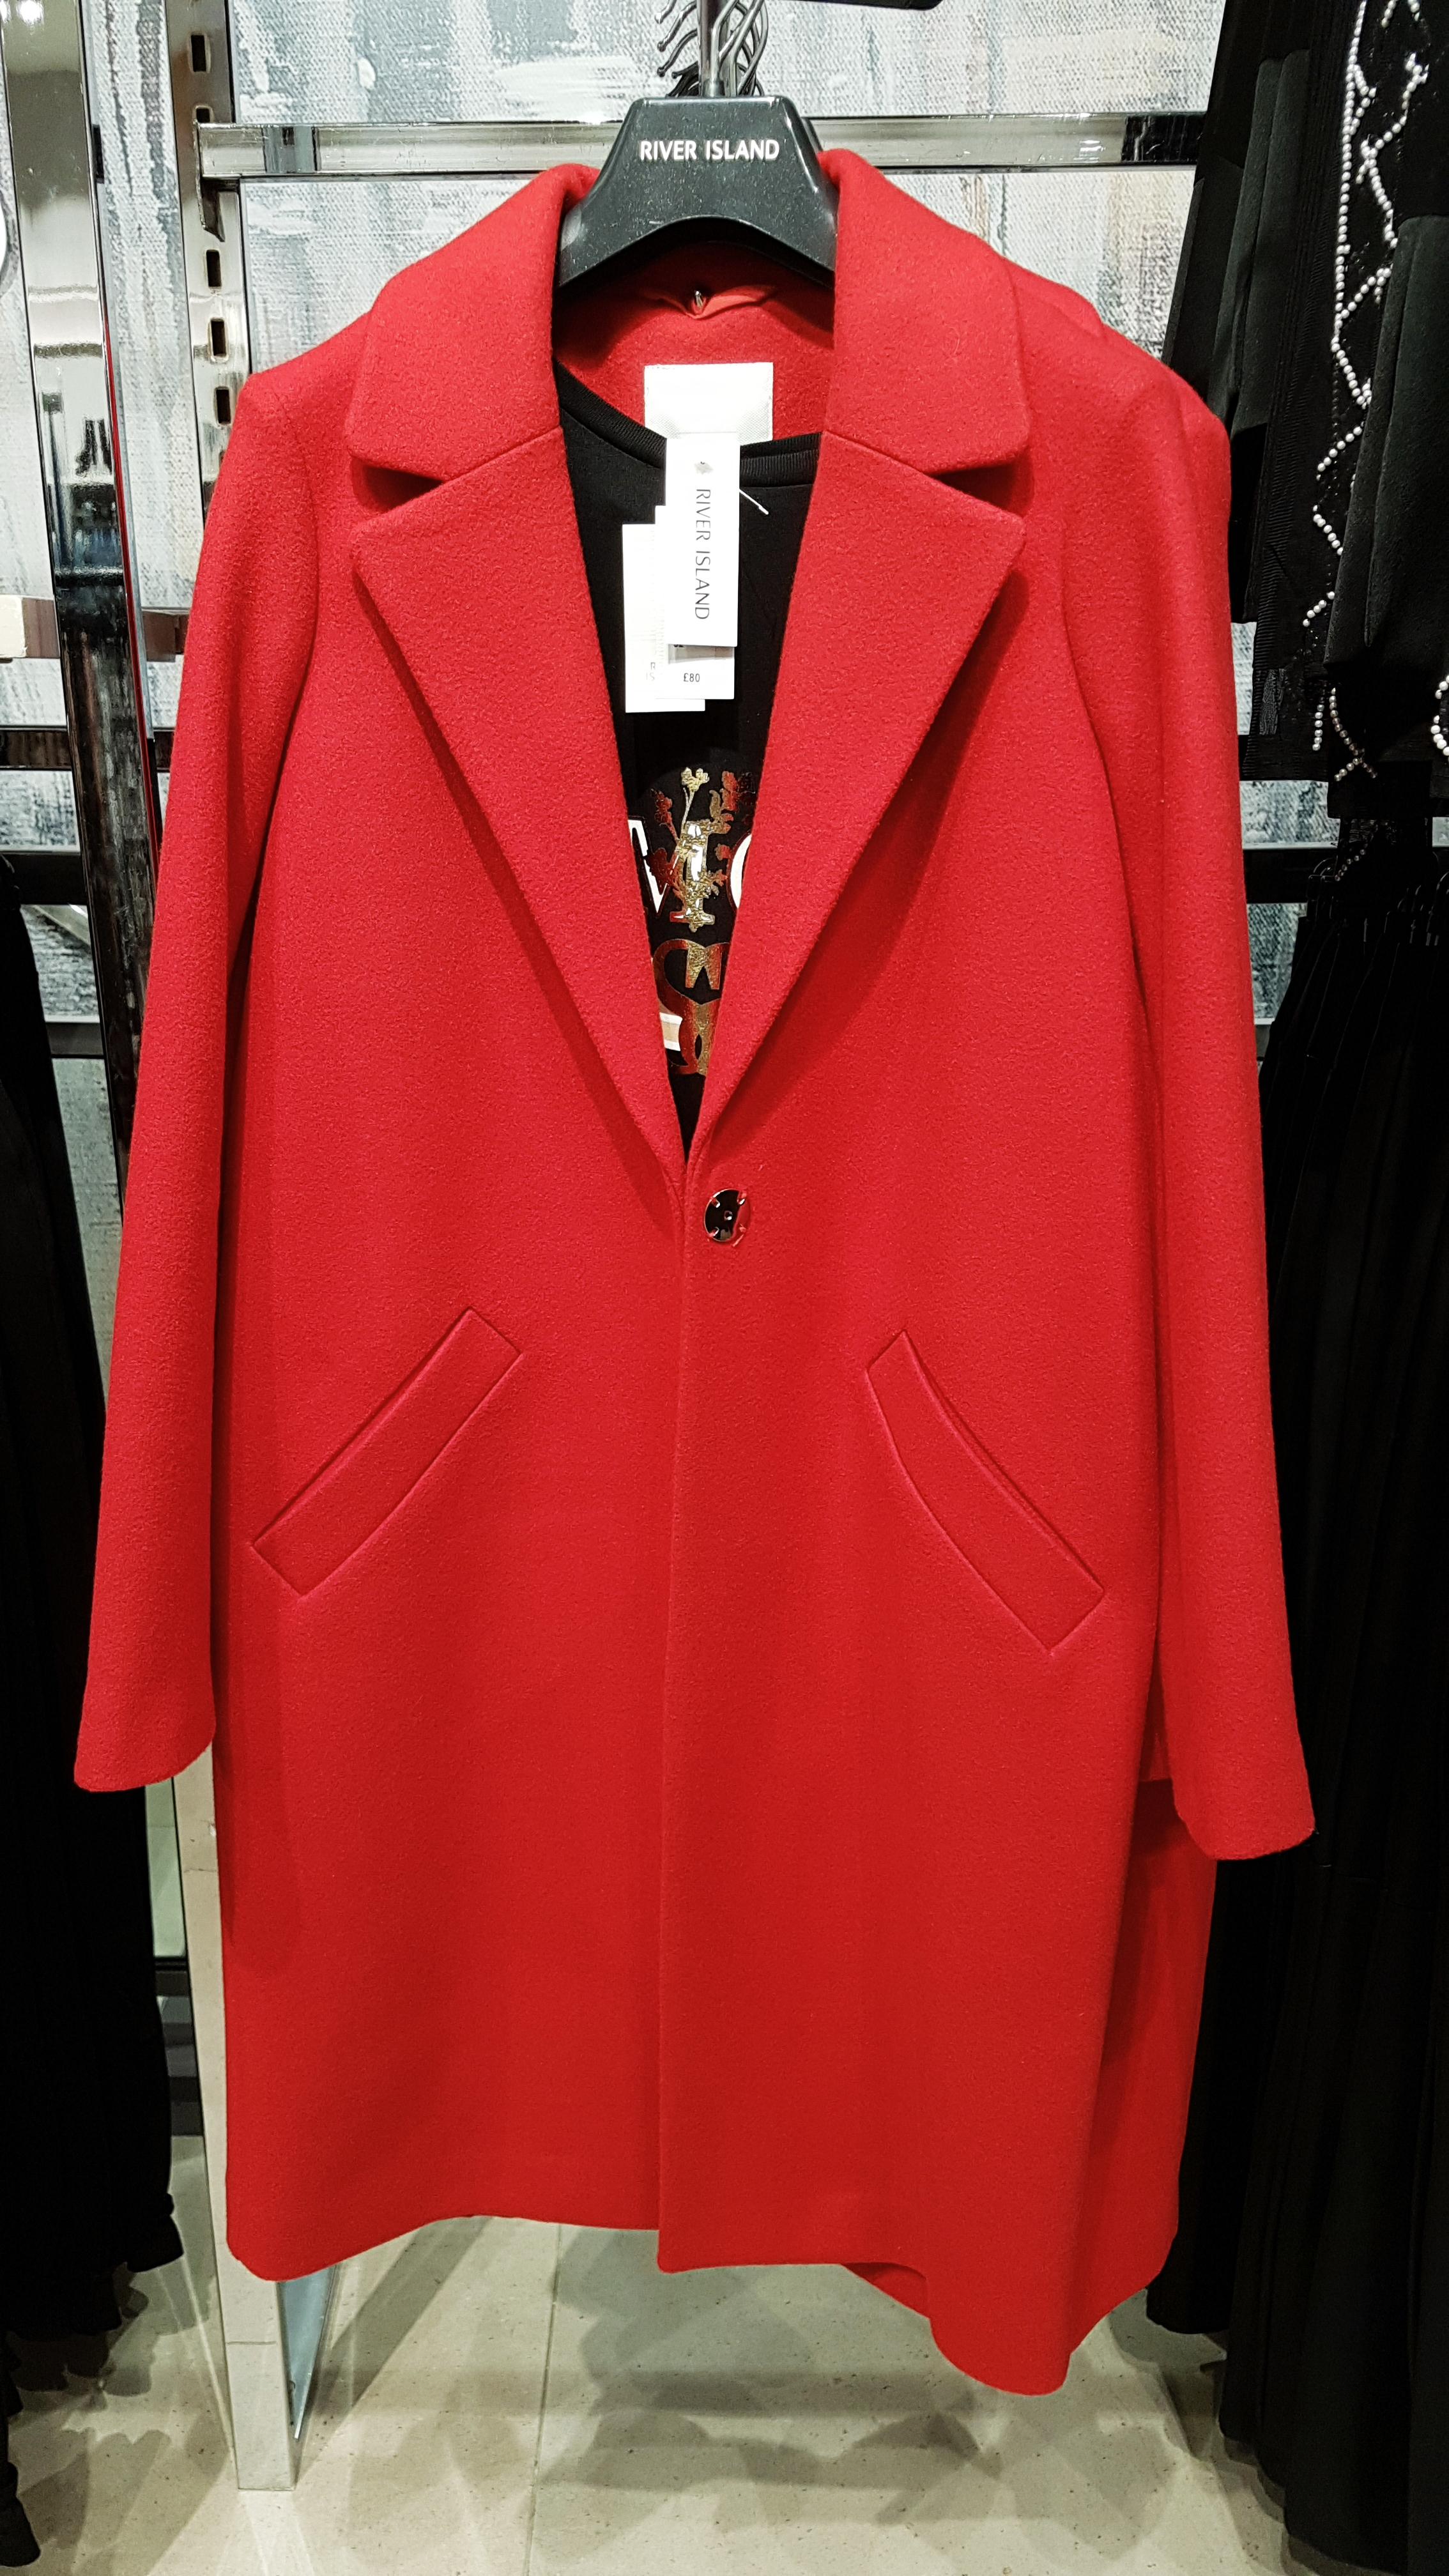 Sian-victoria-river-island-red-coat-fashion-blog.jpg